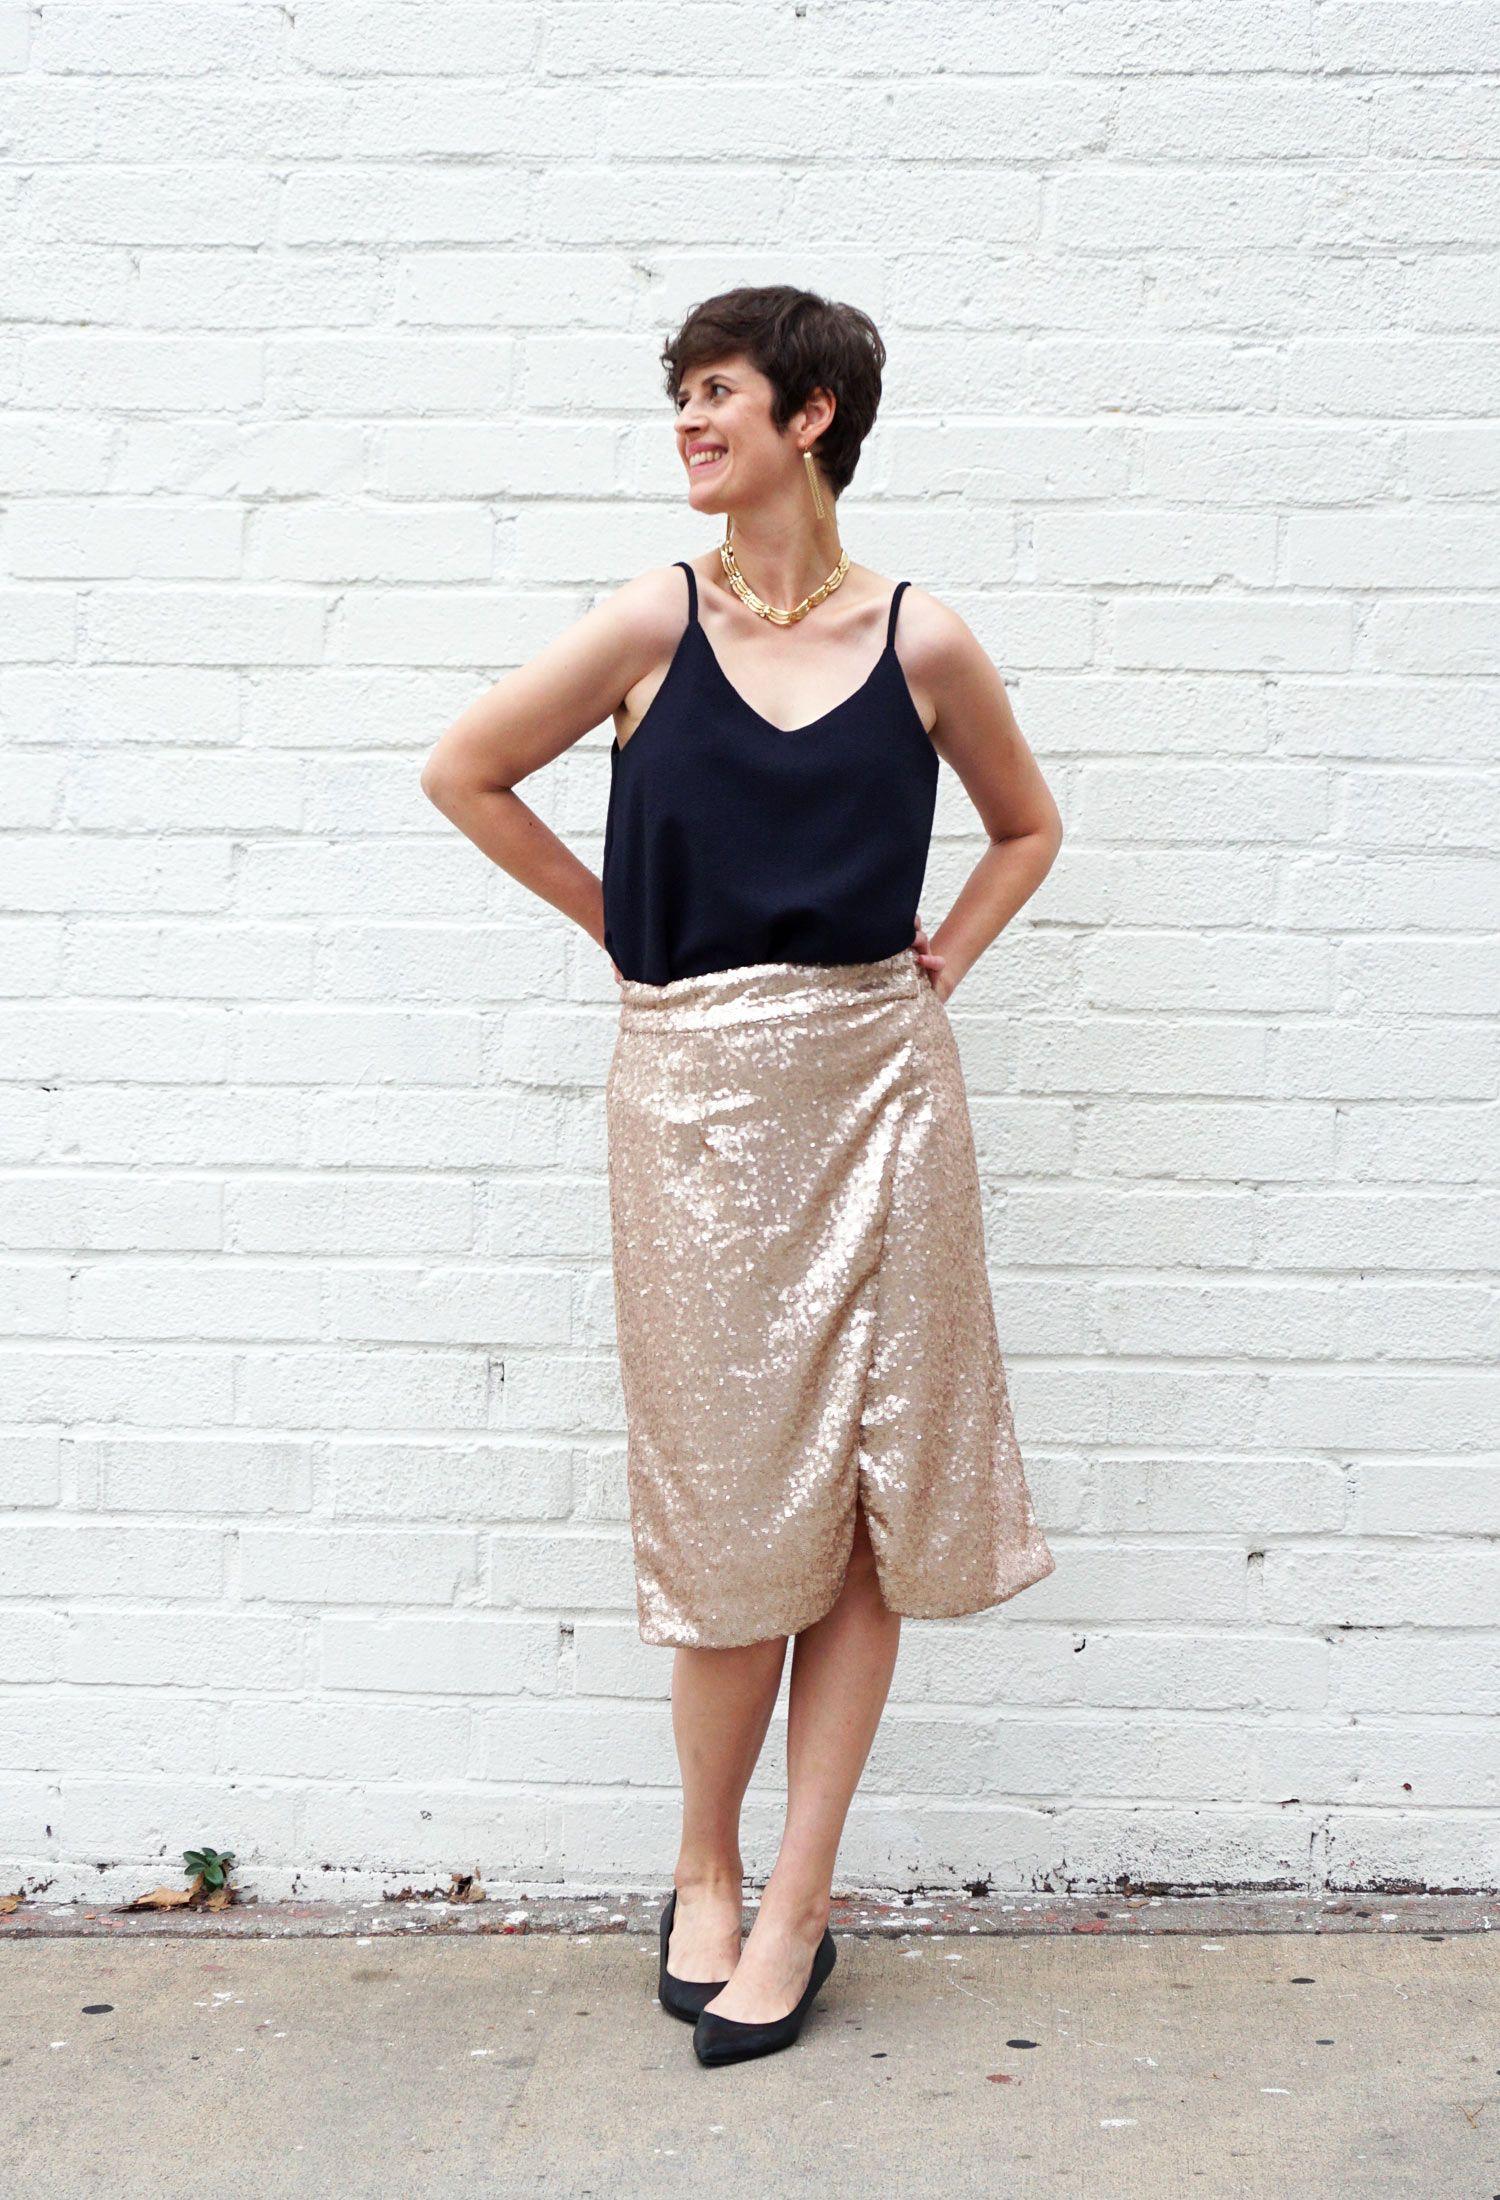 d8f8a5c0136ce7 DIY Sequin Wrap Skirt | Alter. Sew. Strut. Fashion! | Skirt patterns ...